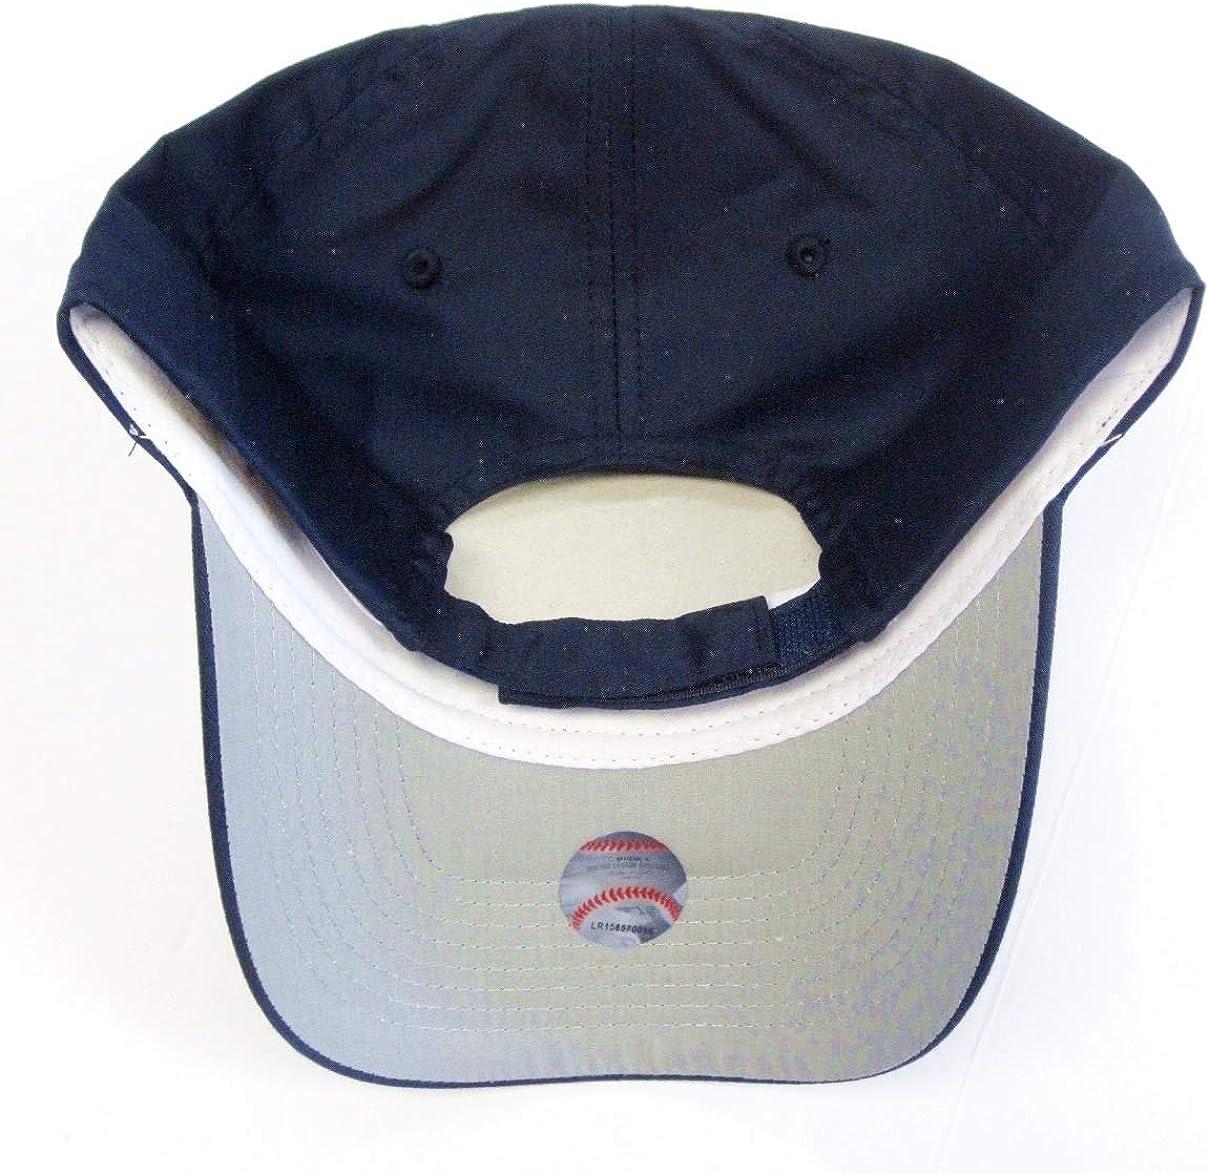 Tampa Bay Rays MLB OC Sports Navy Blue Hat Cap TB Logo Adult Men's Adjustable : Clothing